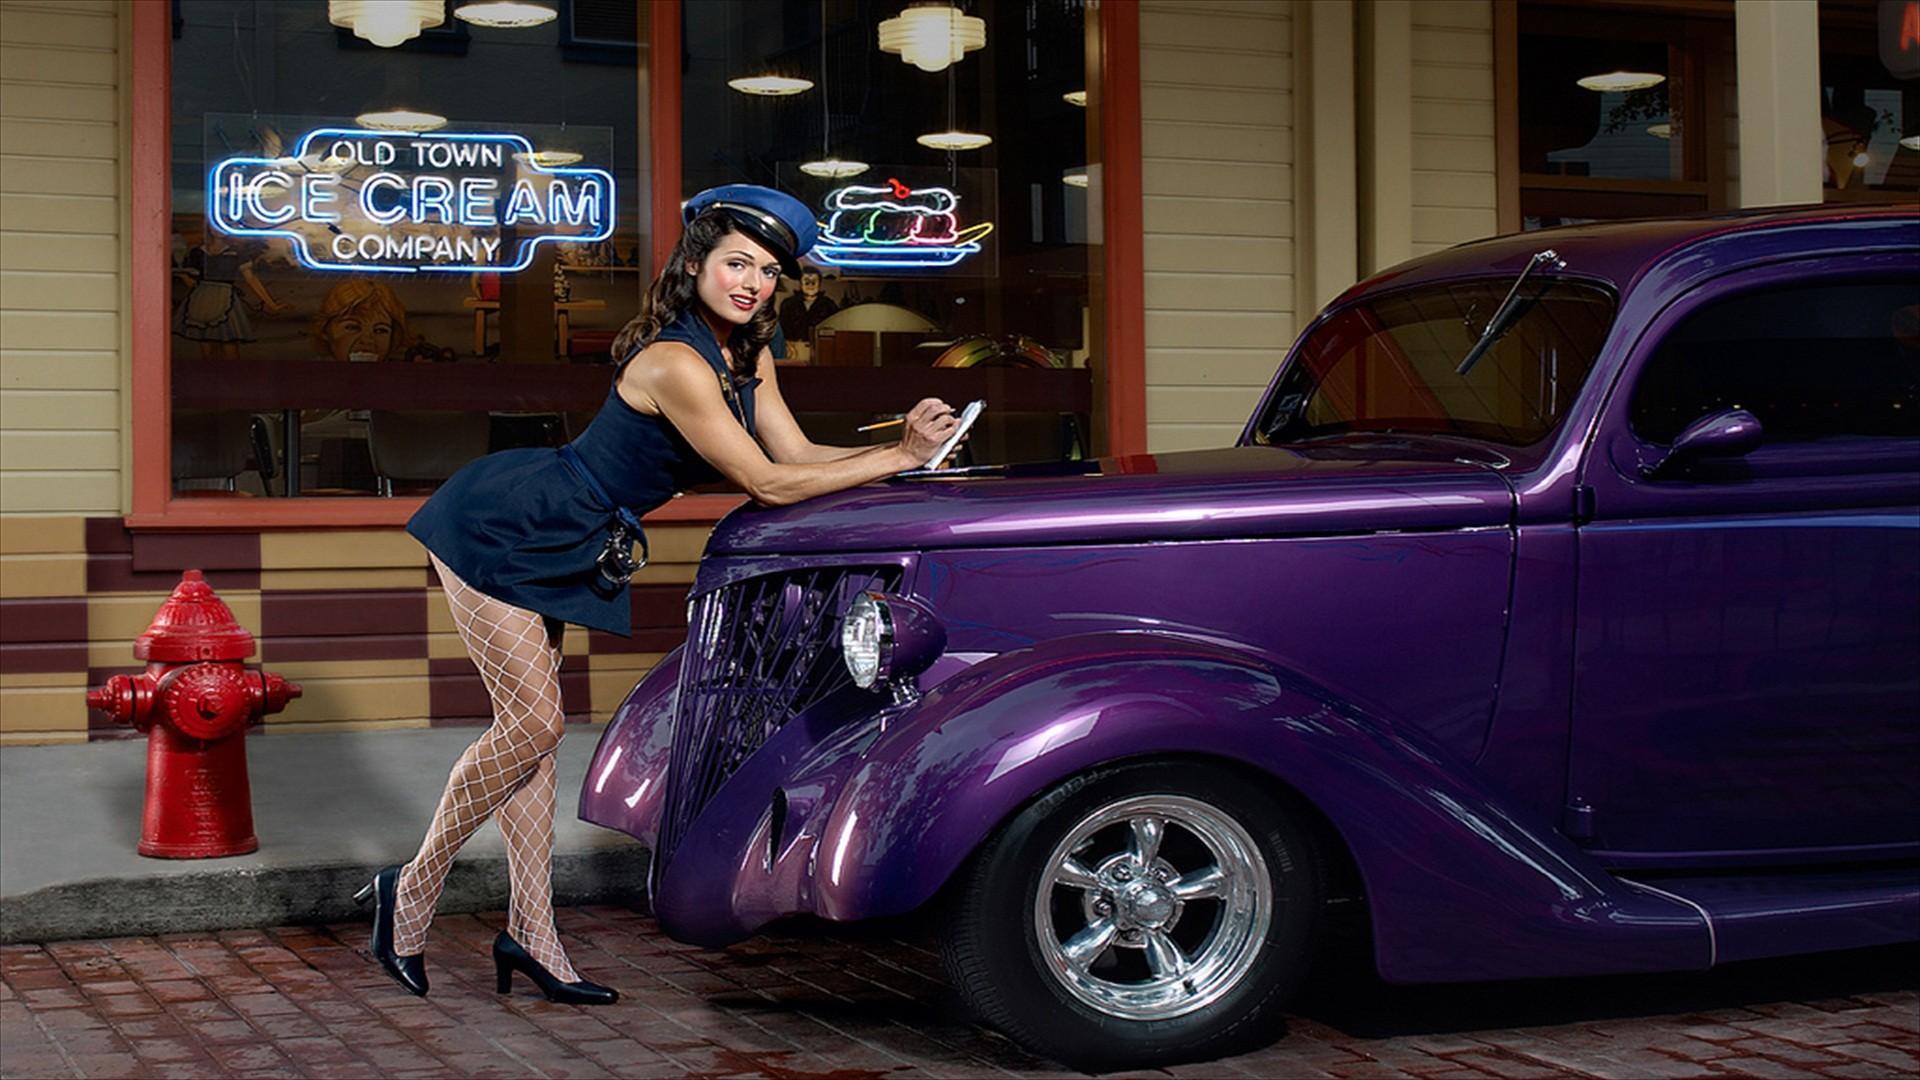 People 1920x1080 Oldtimer car women with cars purple cars legs purple police women Vintage car